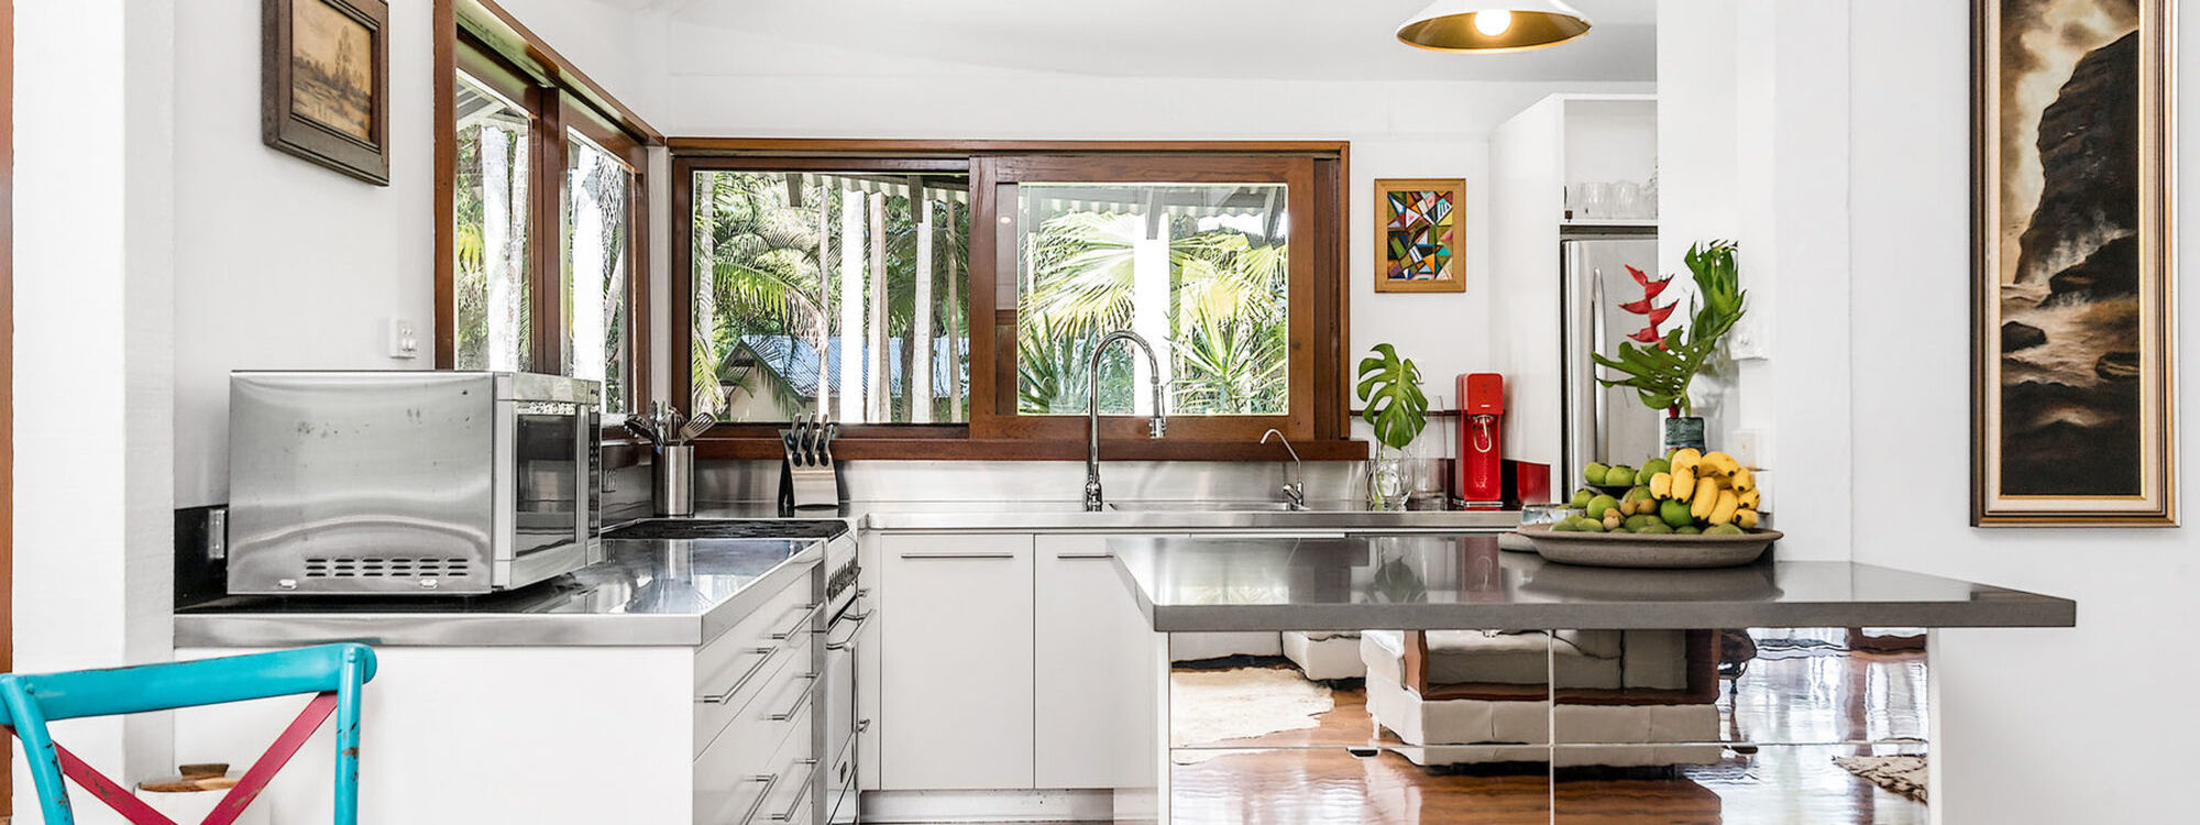 Ourmuli - Byron Bay - Kitchen